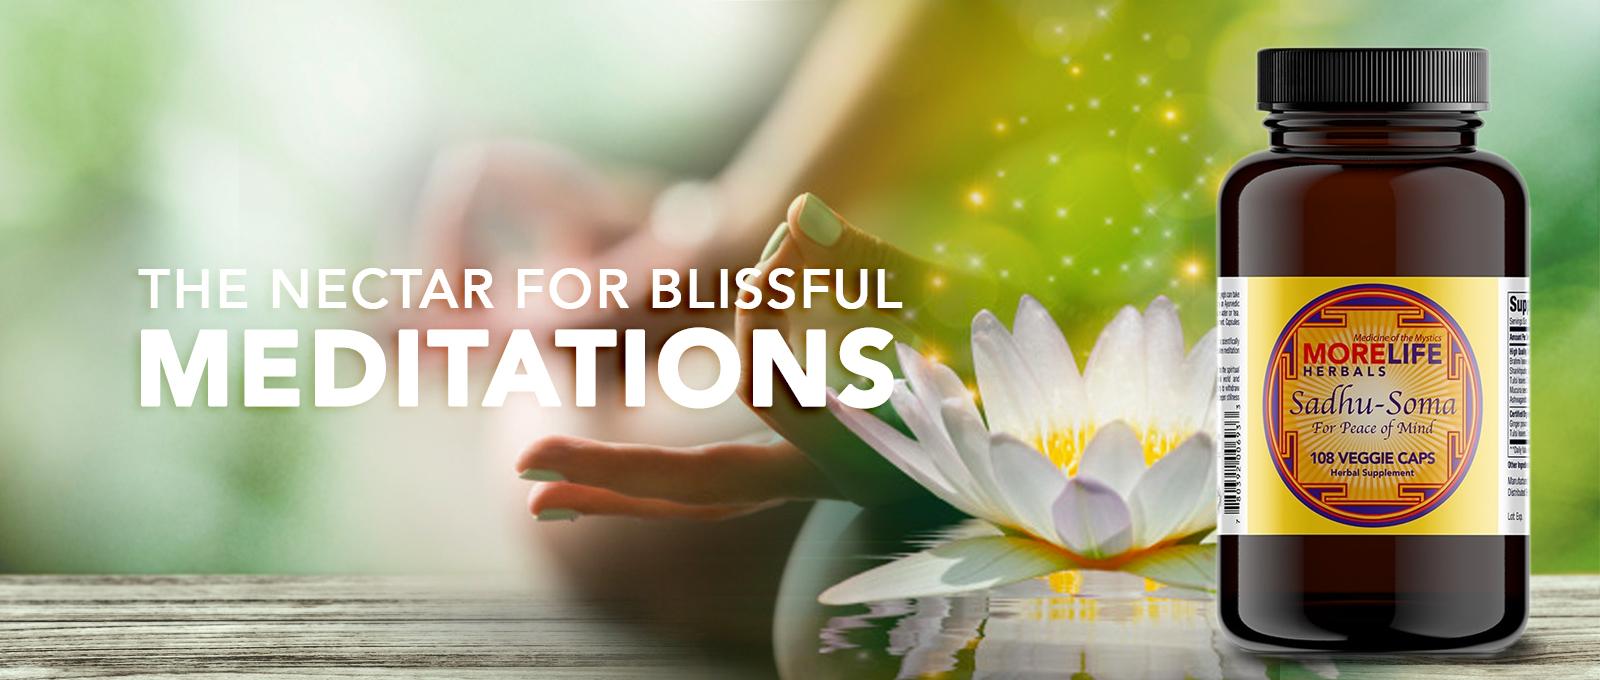 MoreLife Market – Meditation Sadhu